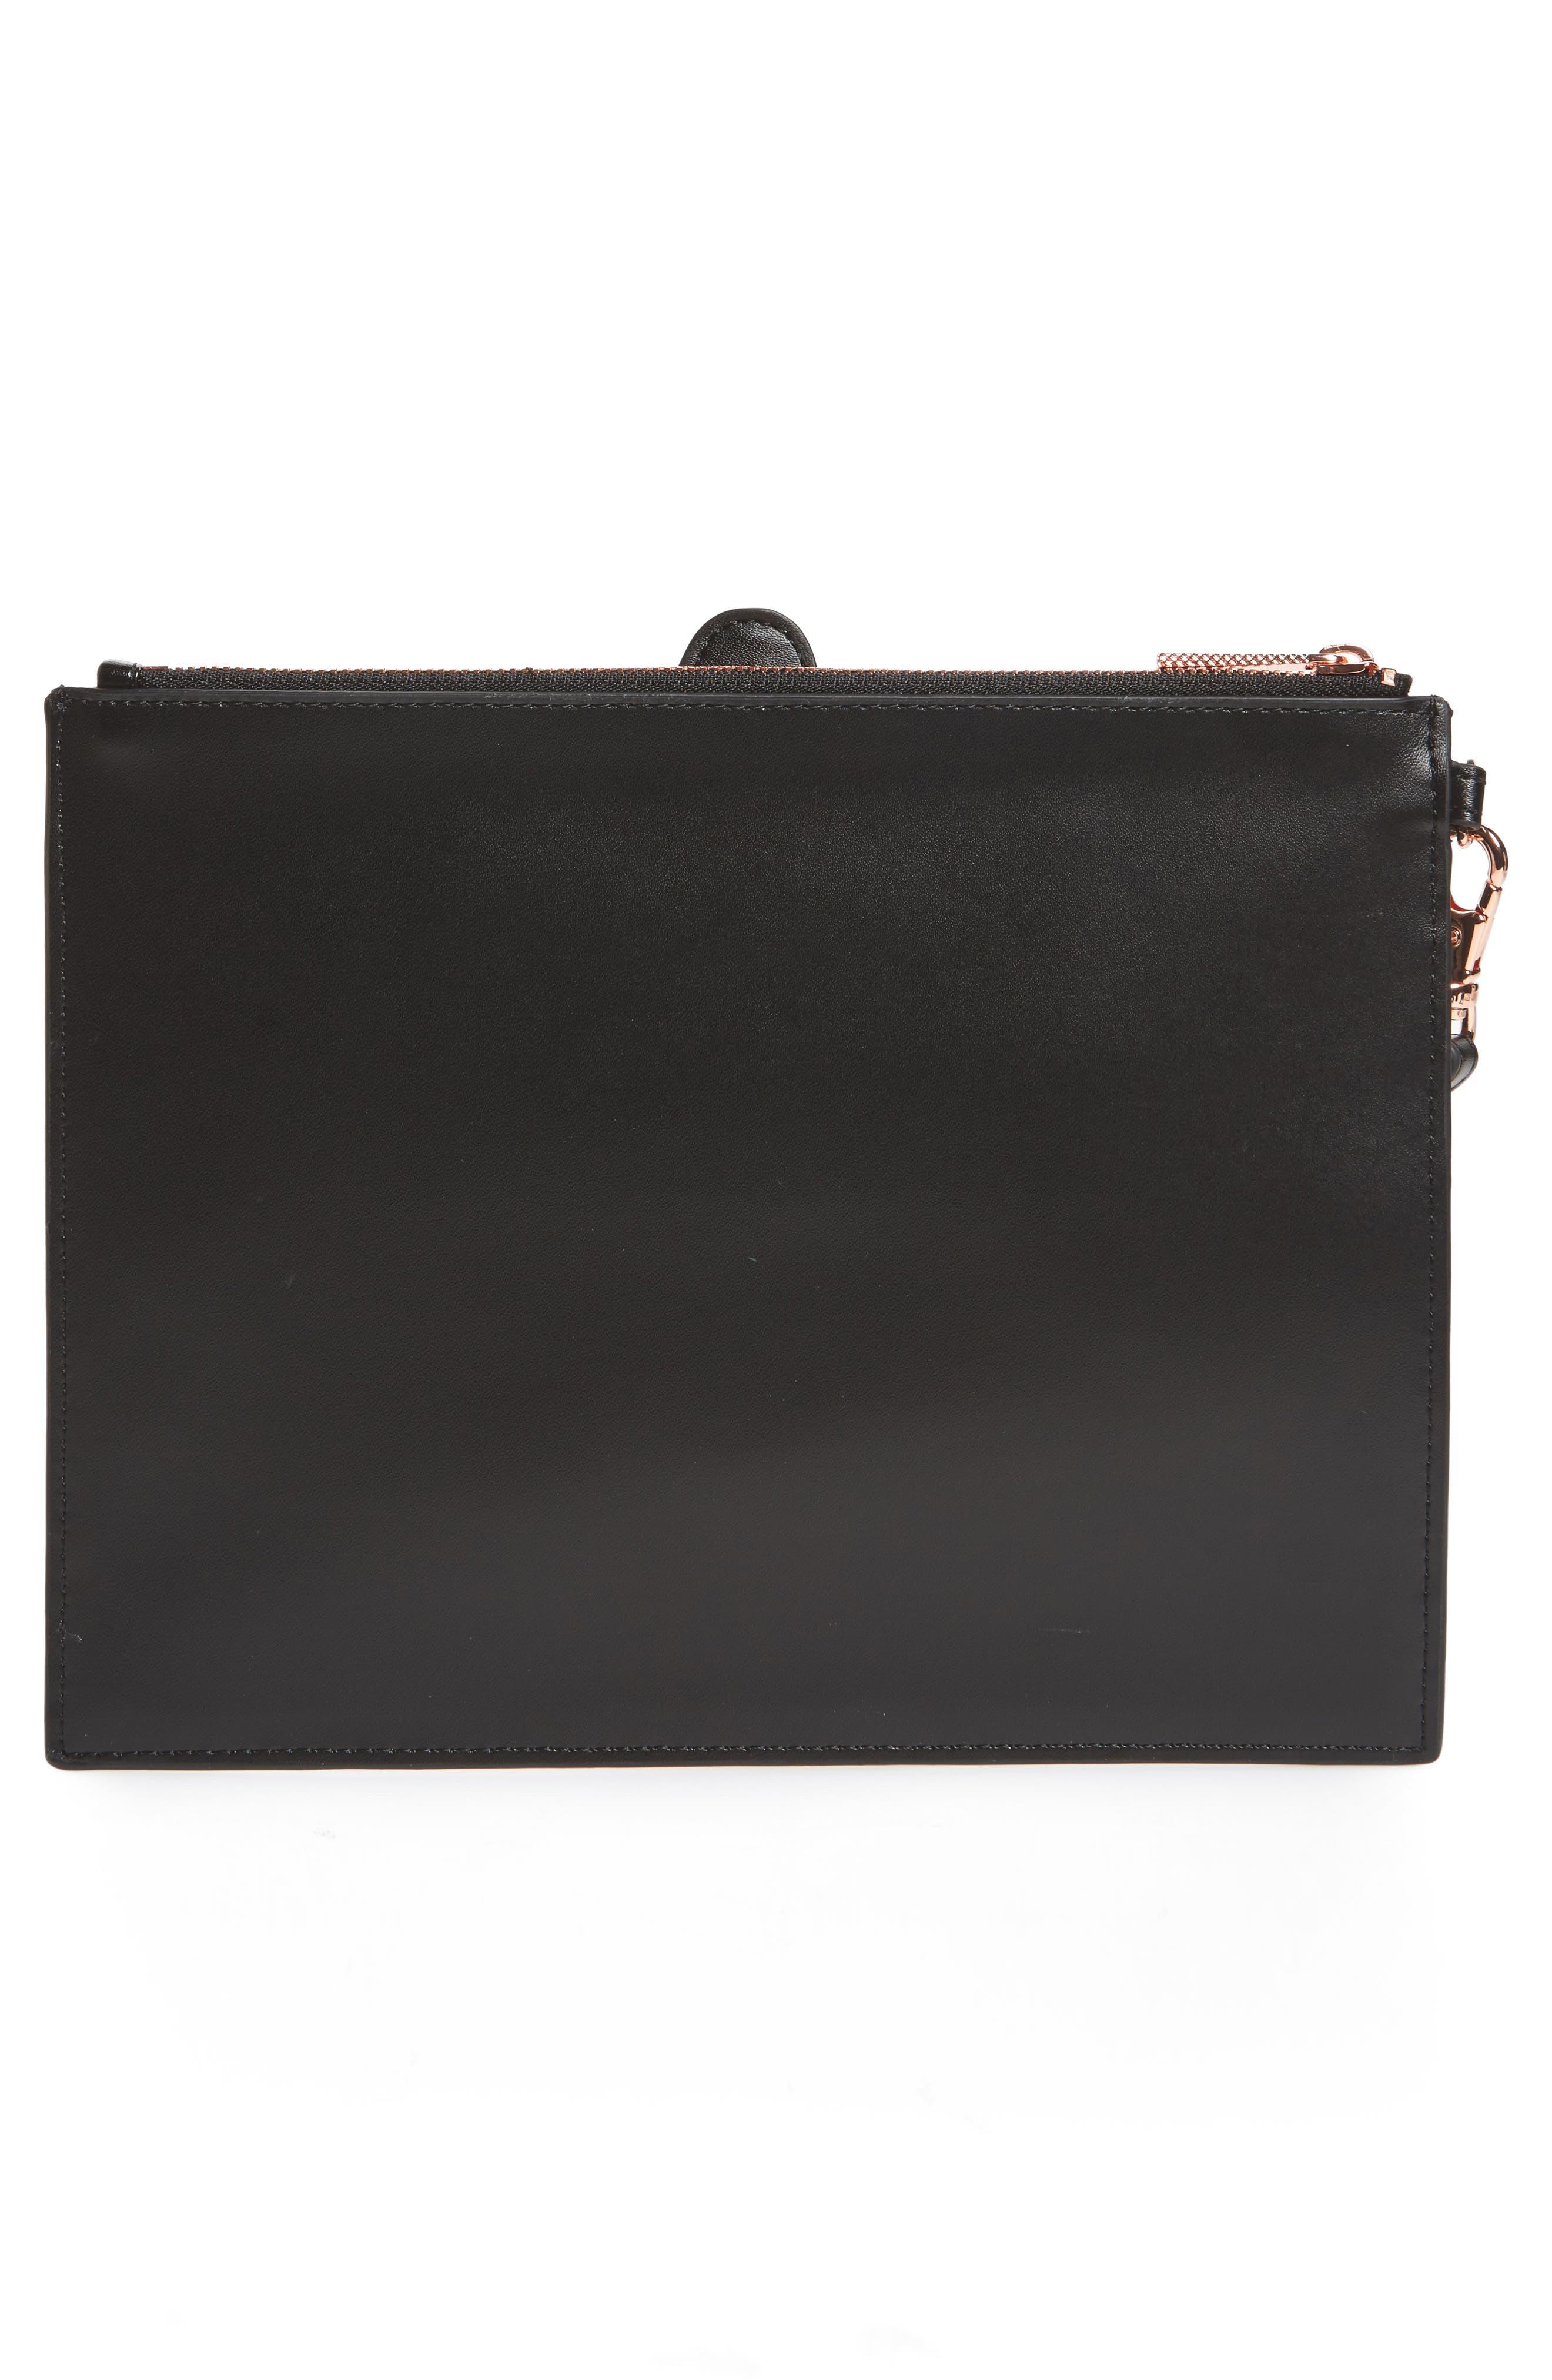 Barker Leather Pouch,                             Alternate thumbnail 3, color,                             Black